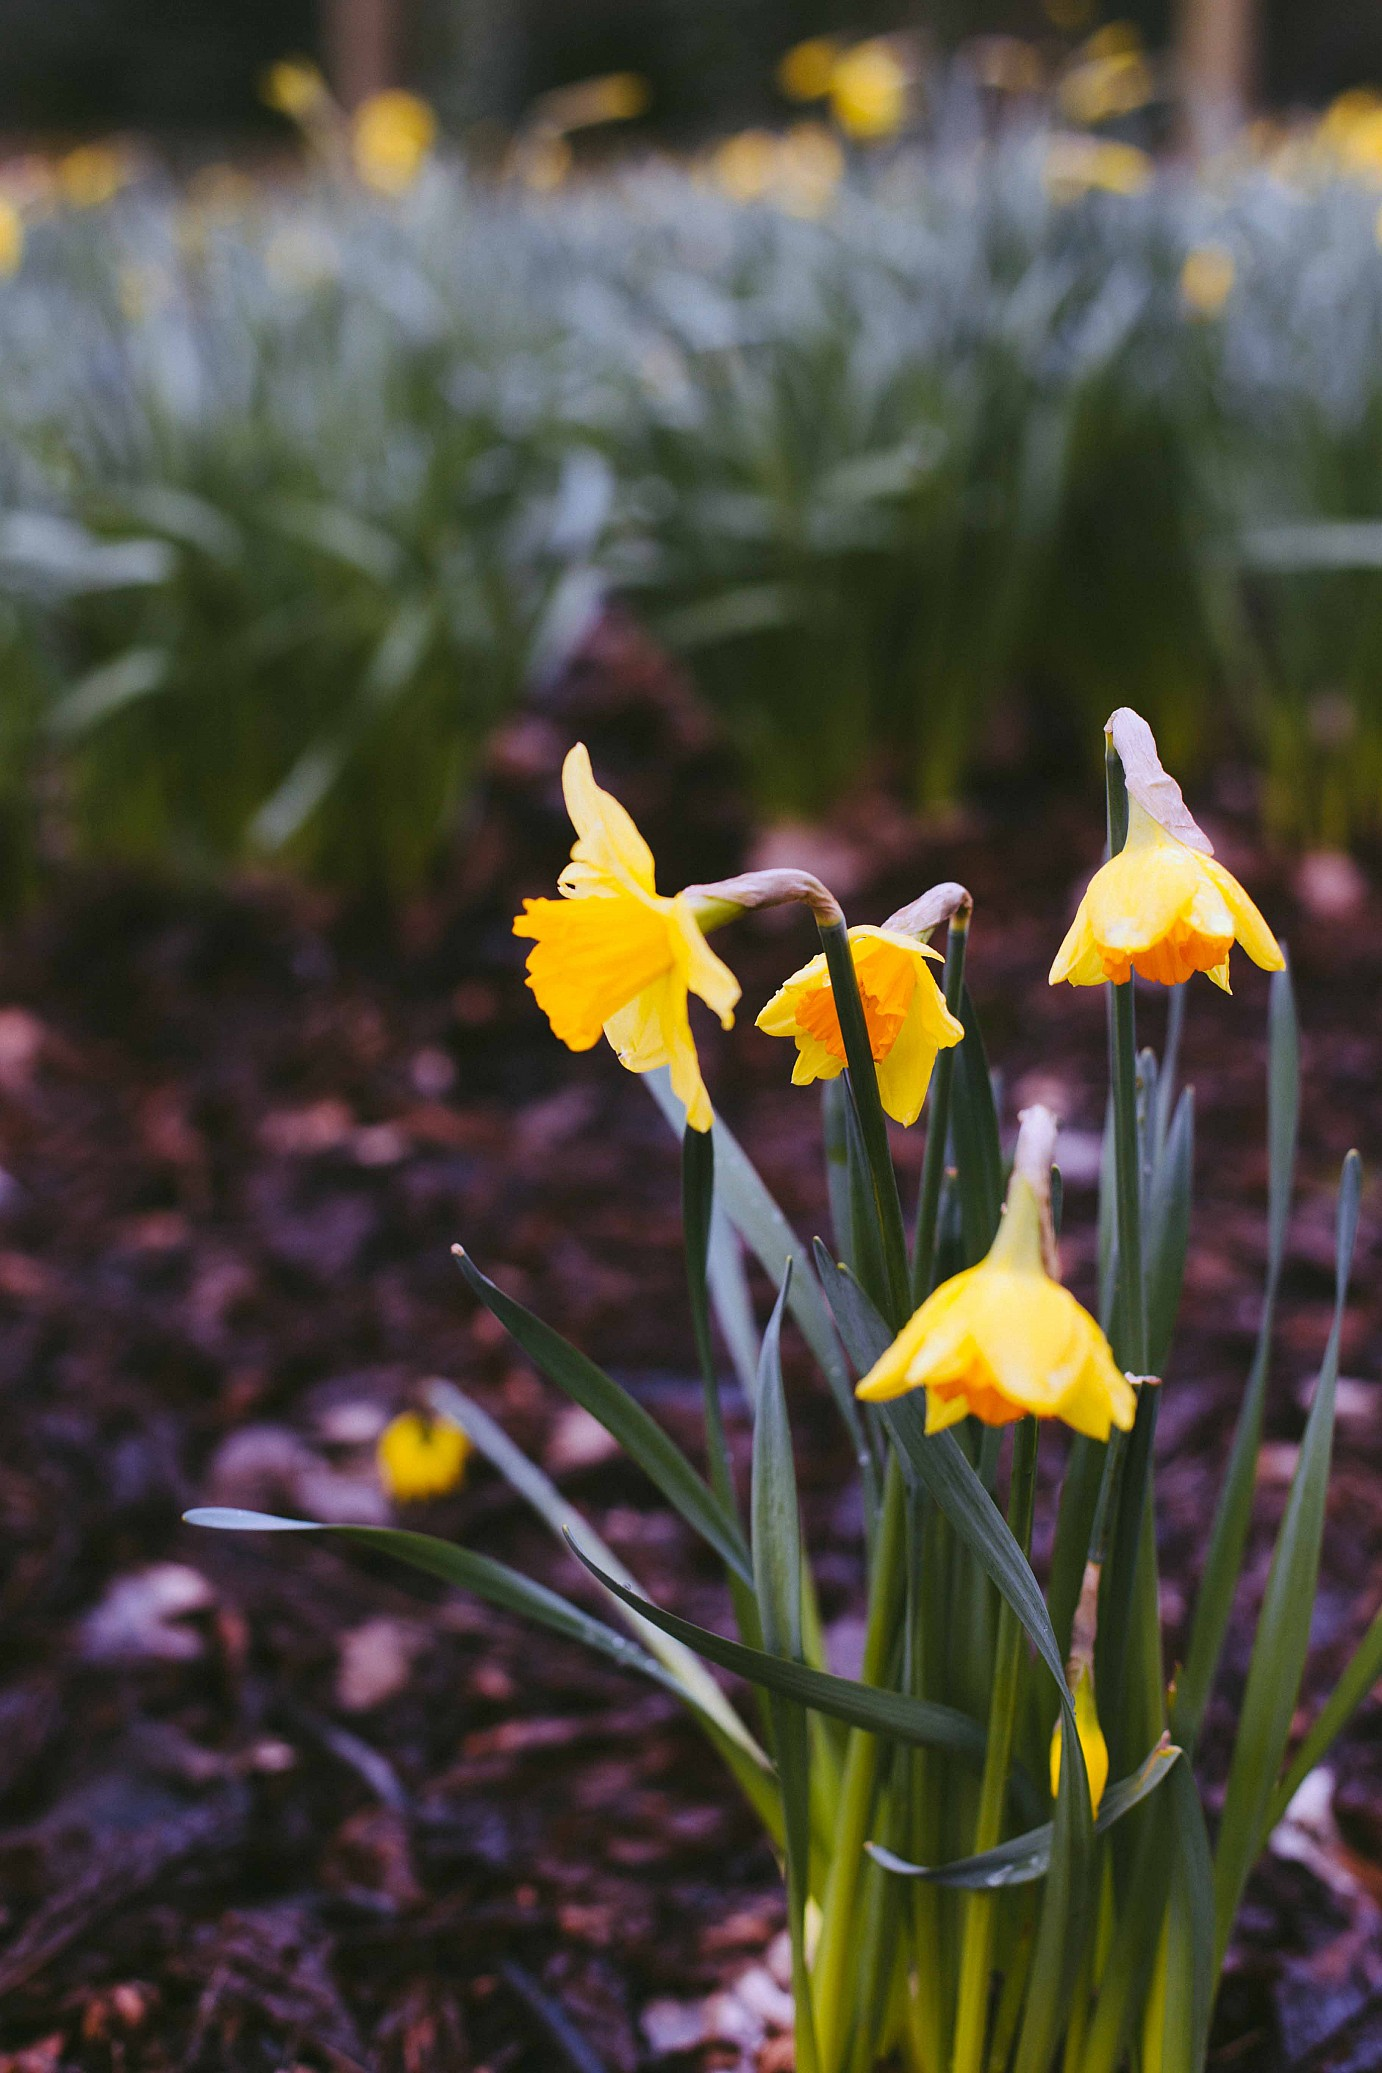 veronica-armstrong-daffodil